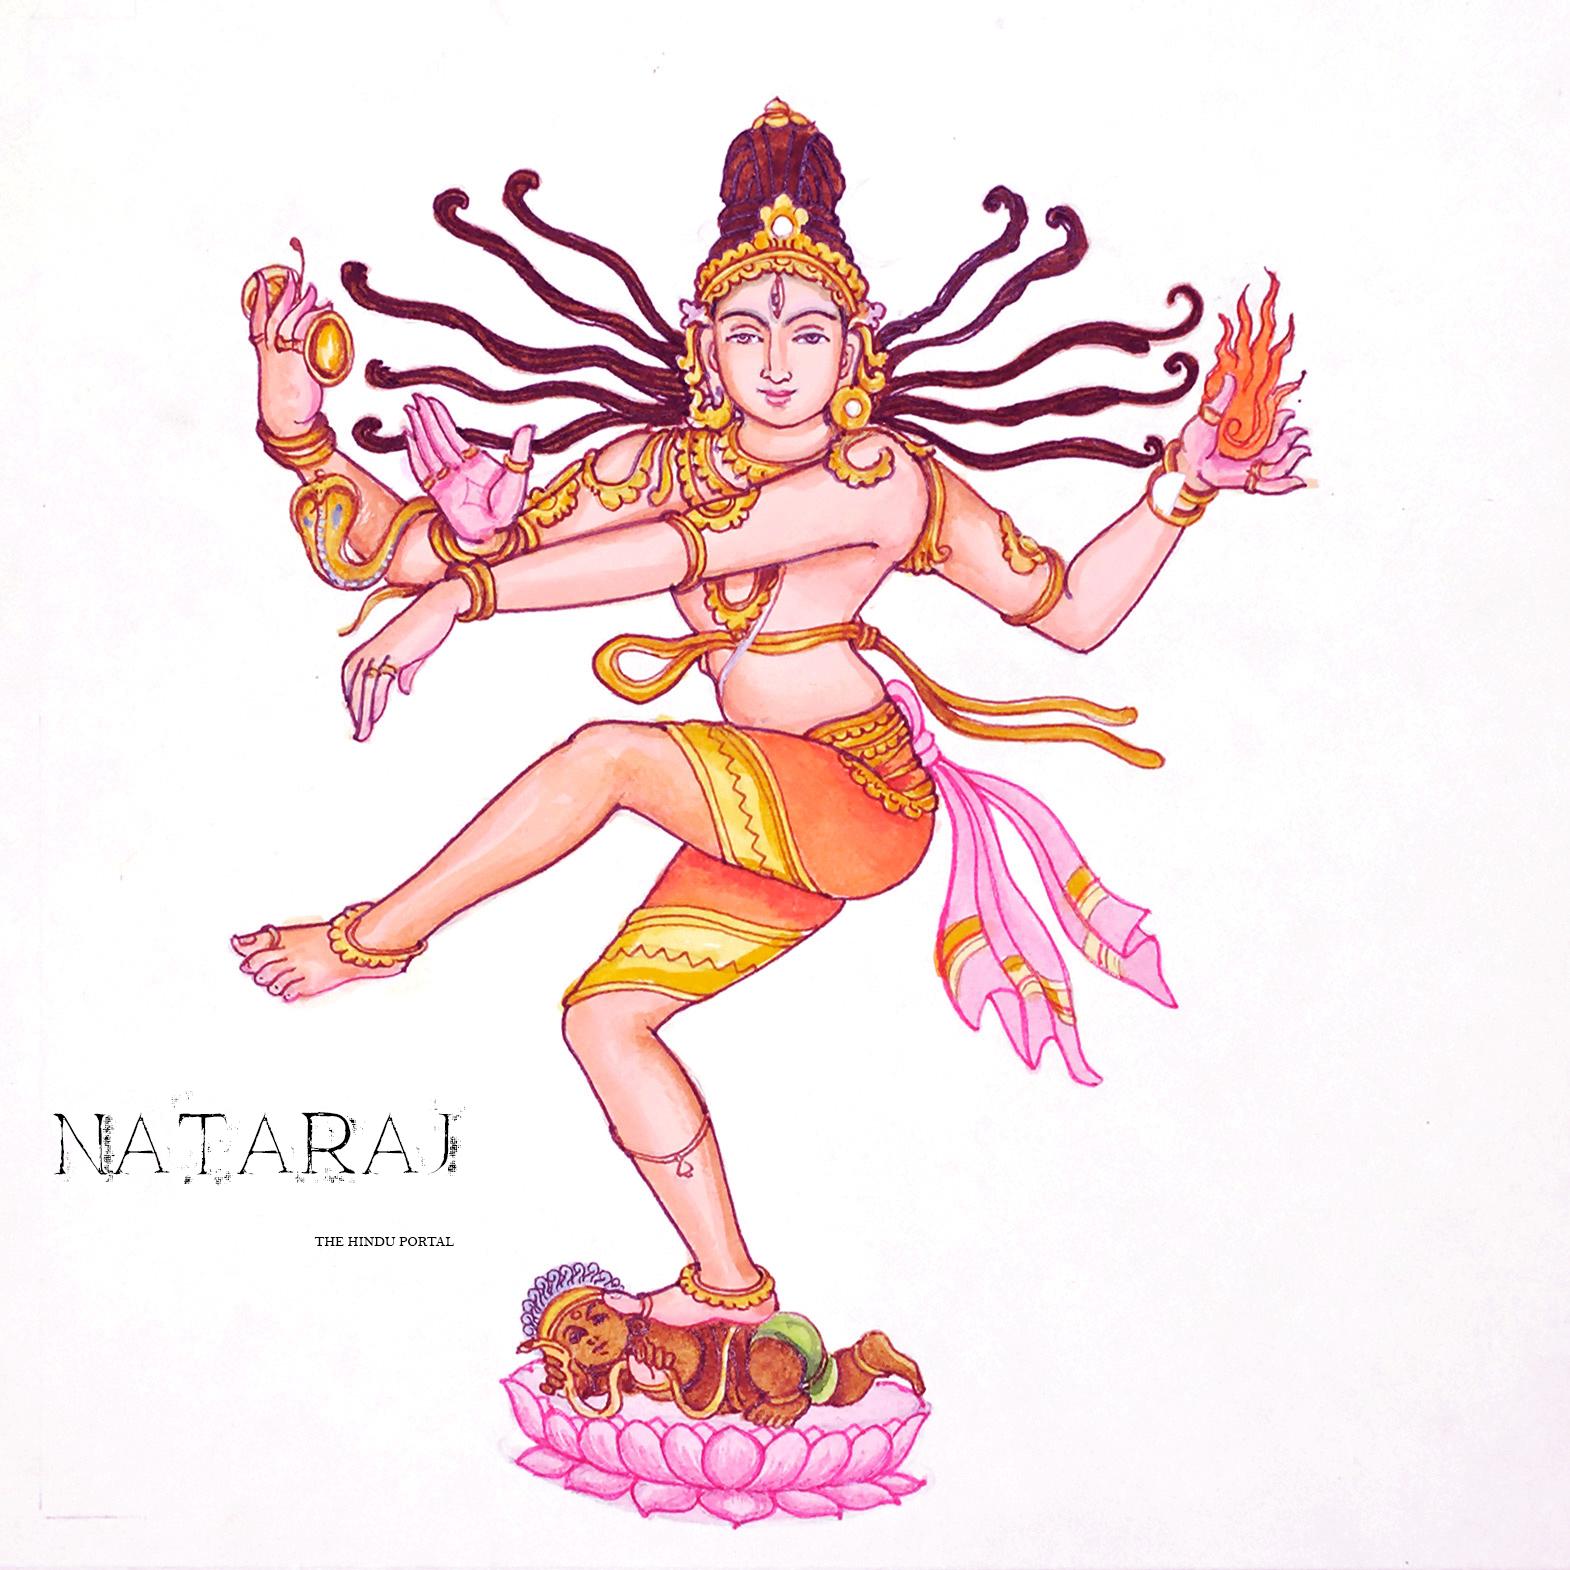 The cosmic dance of Shiva or Nataraja